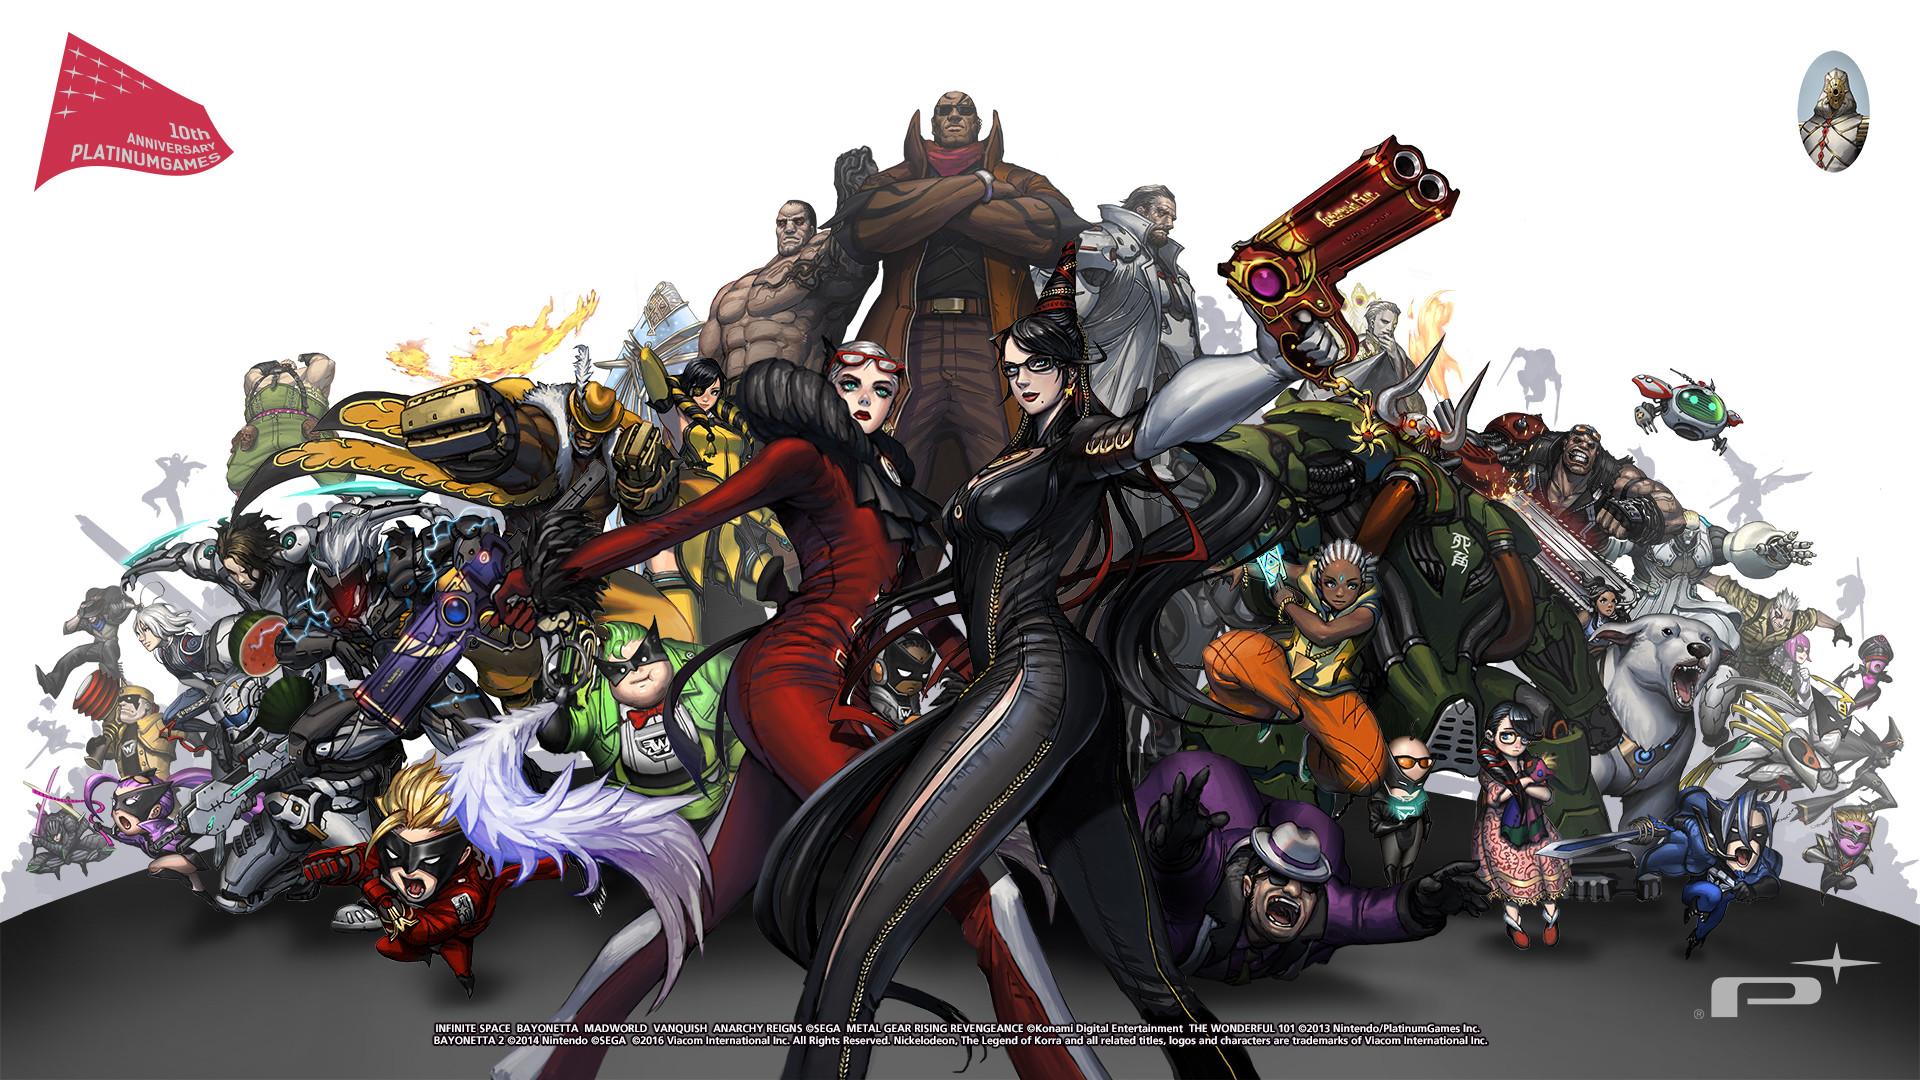 1080p Game/Television/Anime Wallpaper Dump